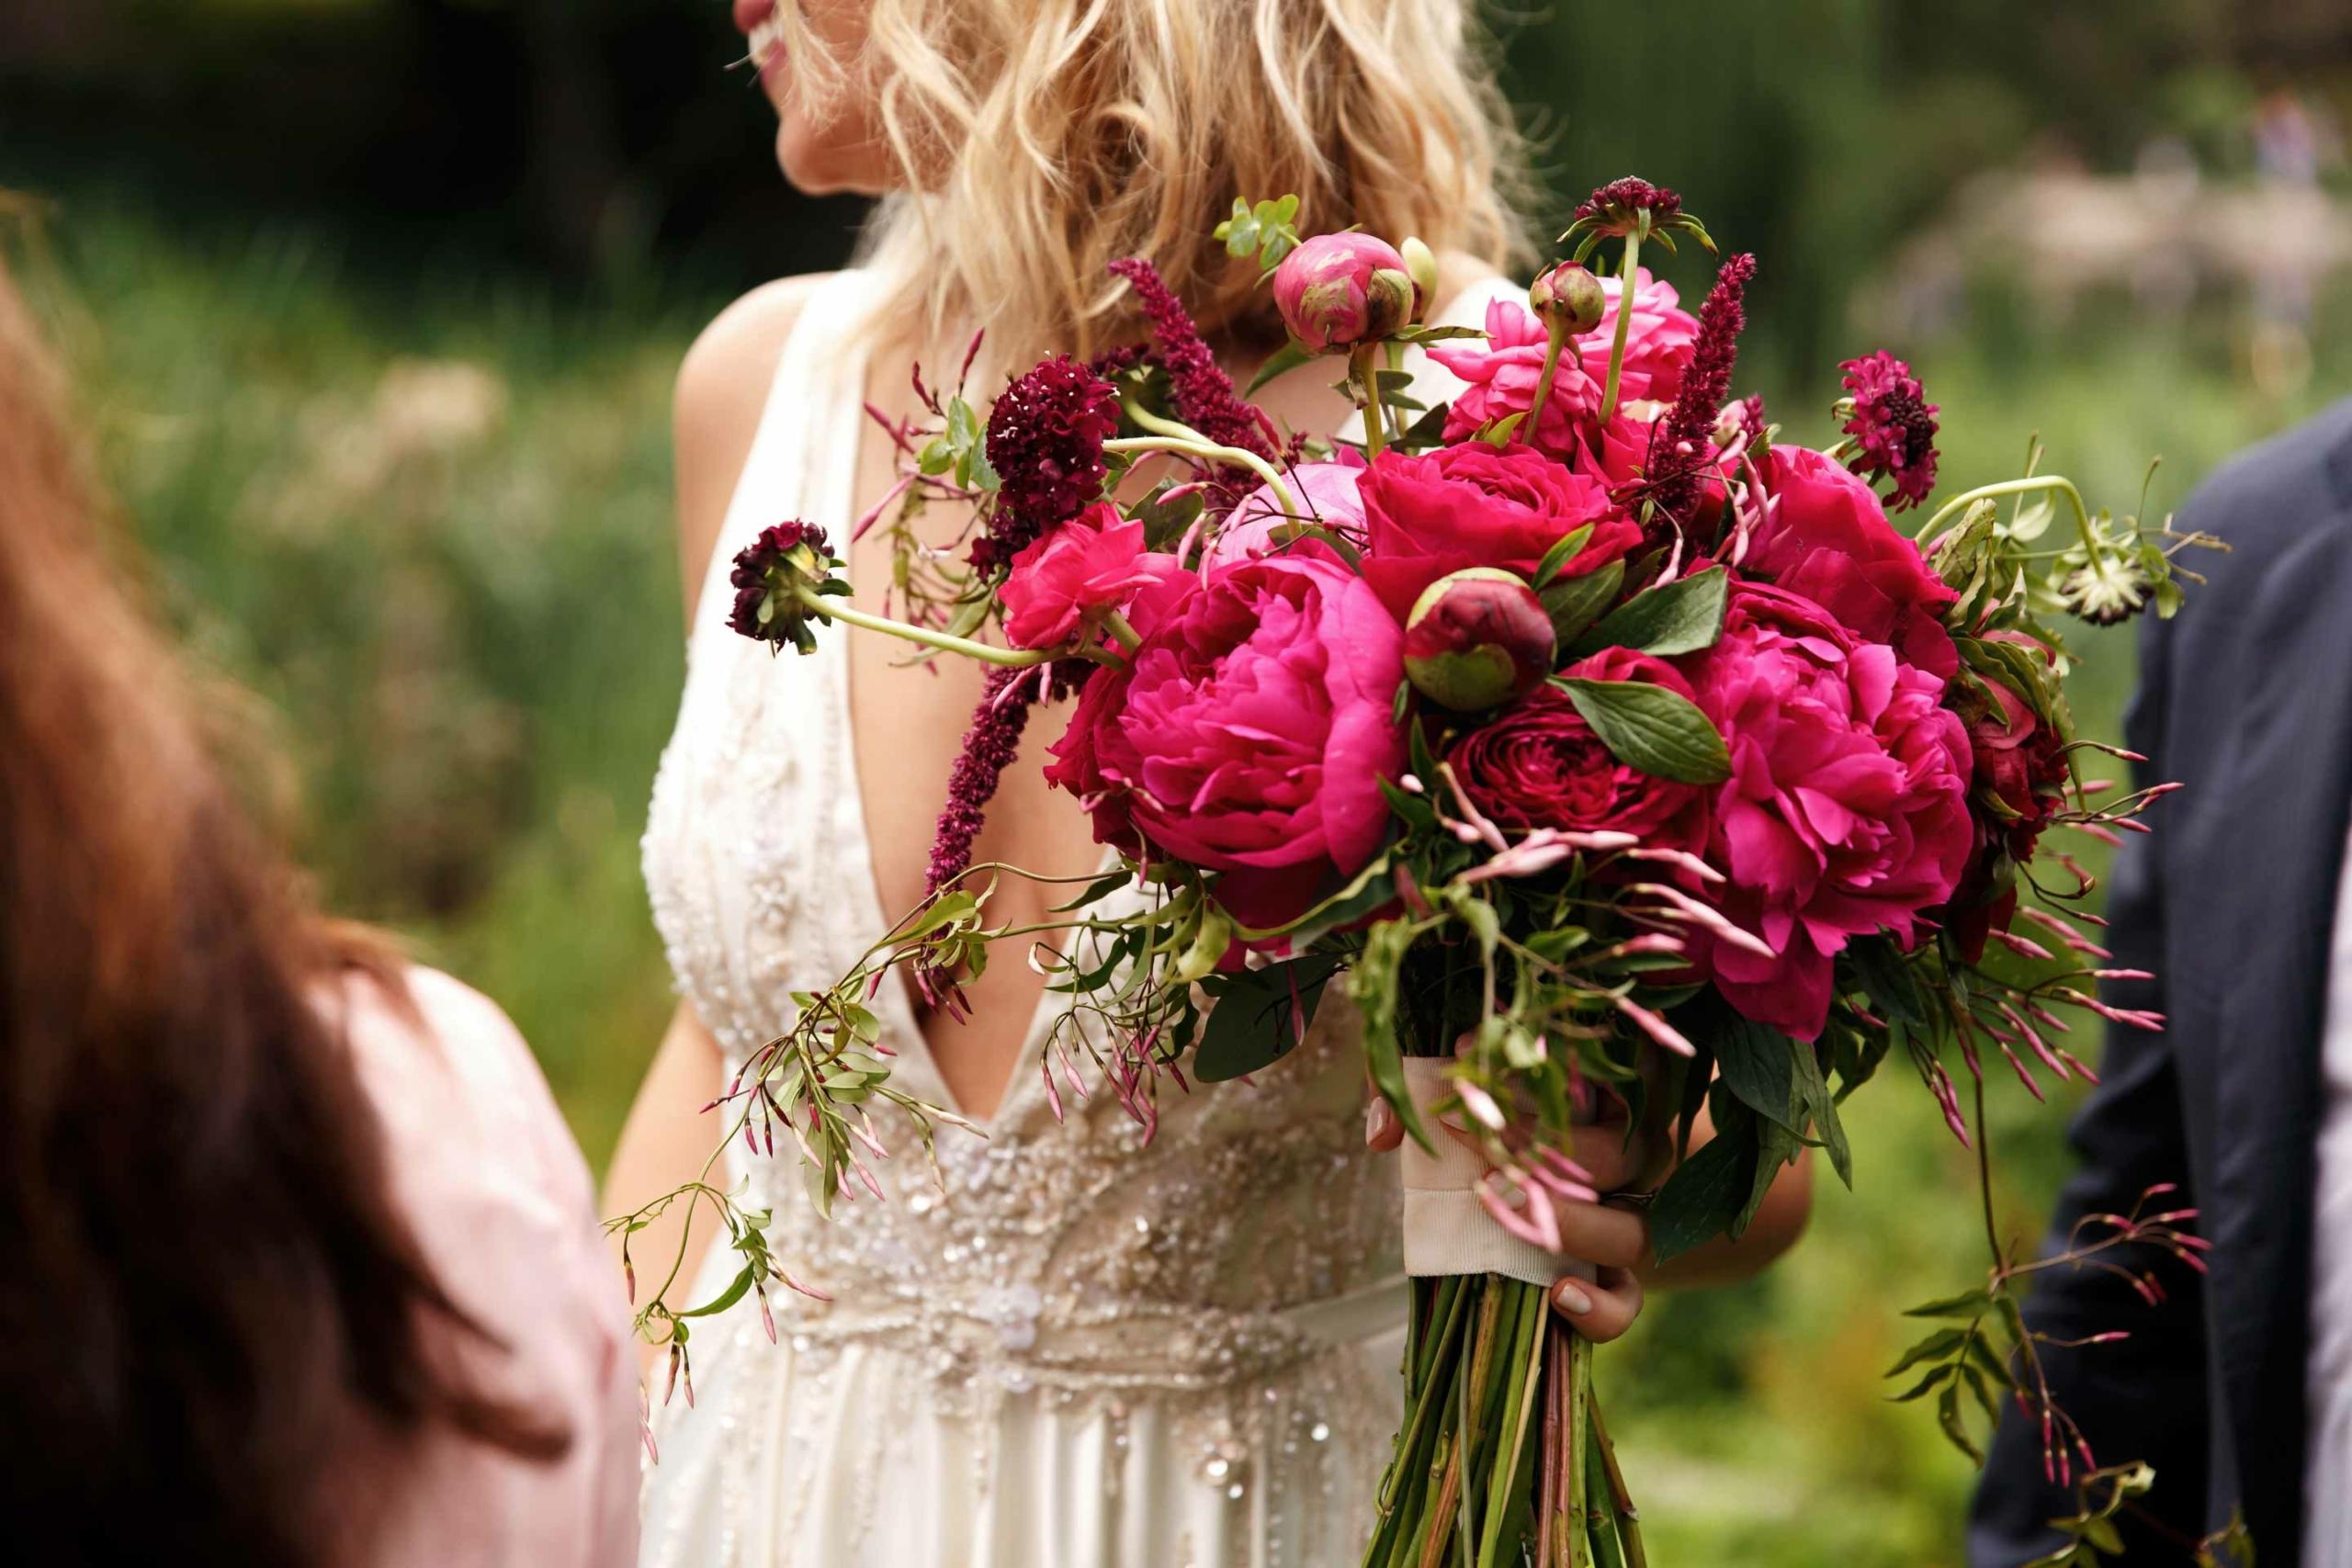 5 Creative Bridal Bouquet Ideas To Steal